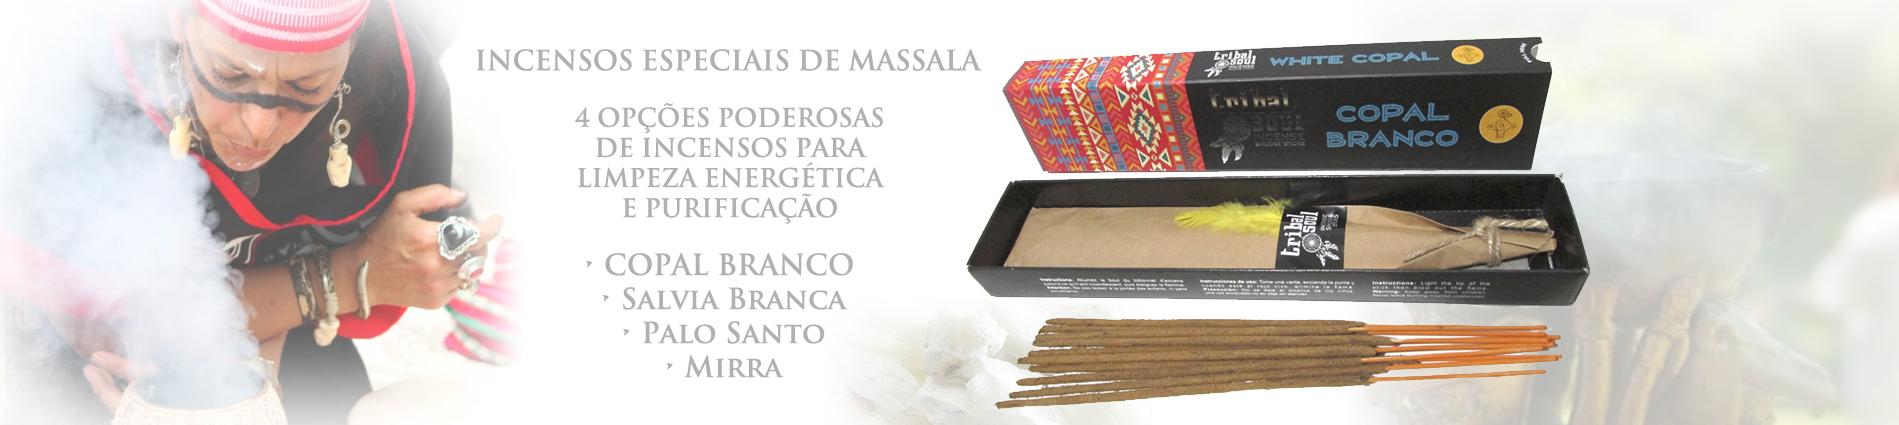 https://cdn.brasilesoterico.com/imagens_banners/23b1a7910dbfbc4867b506472b8a3f06.jpg